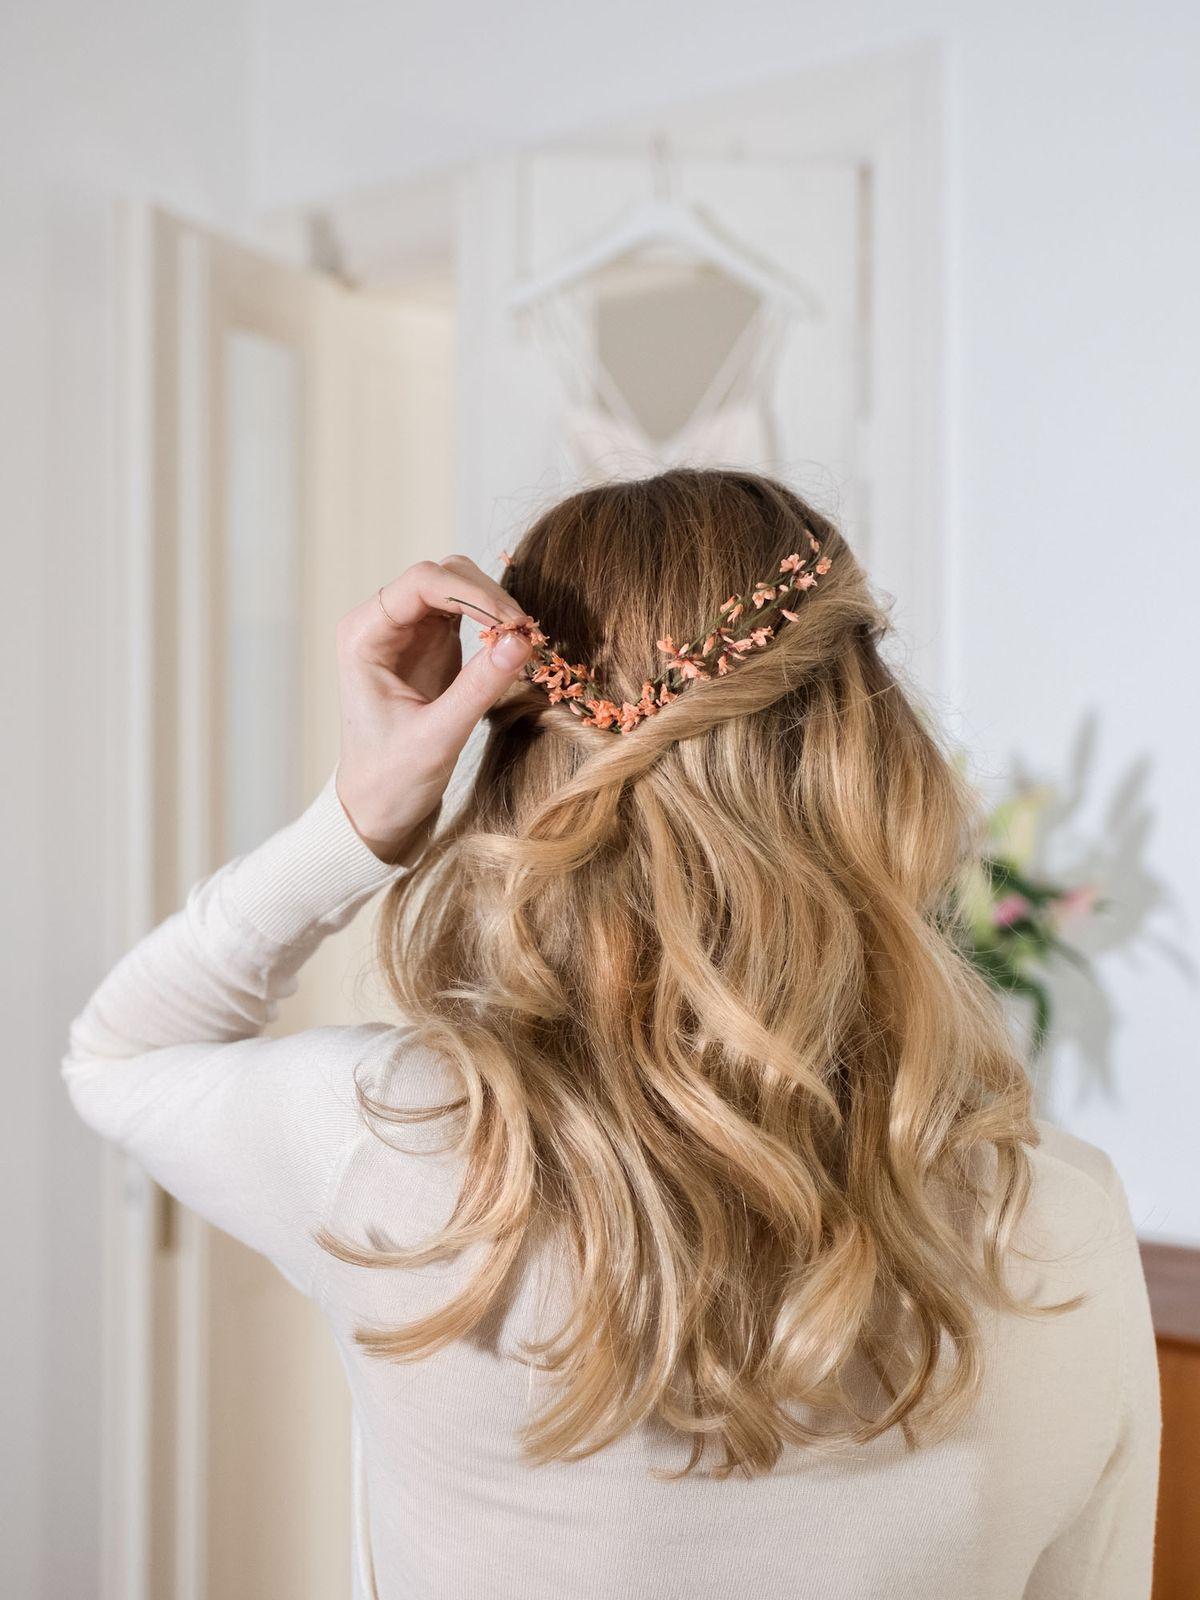 "Beautyblog-Wedding-Hair-Step-by-Step-Waves<p><a href=""http://www.homeinteriordesign.org/2018/02/short-guide-to-interior-decoration.html"">Short guide to interior decoration</a></p>"